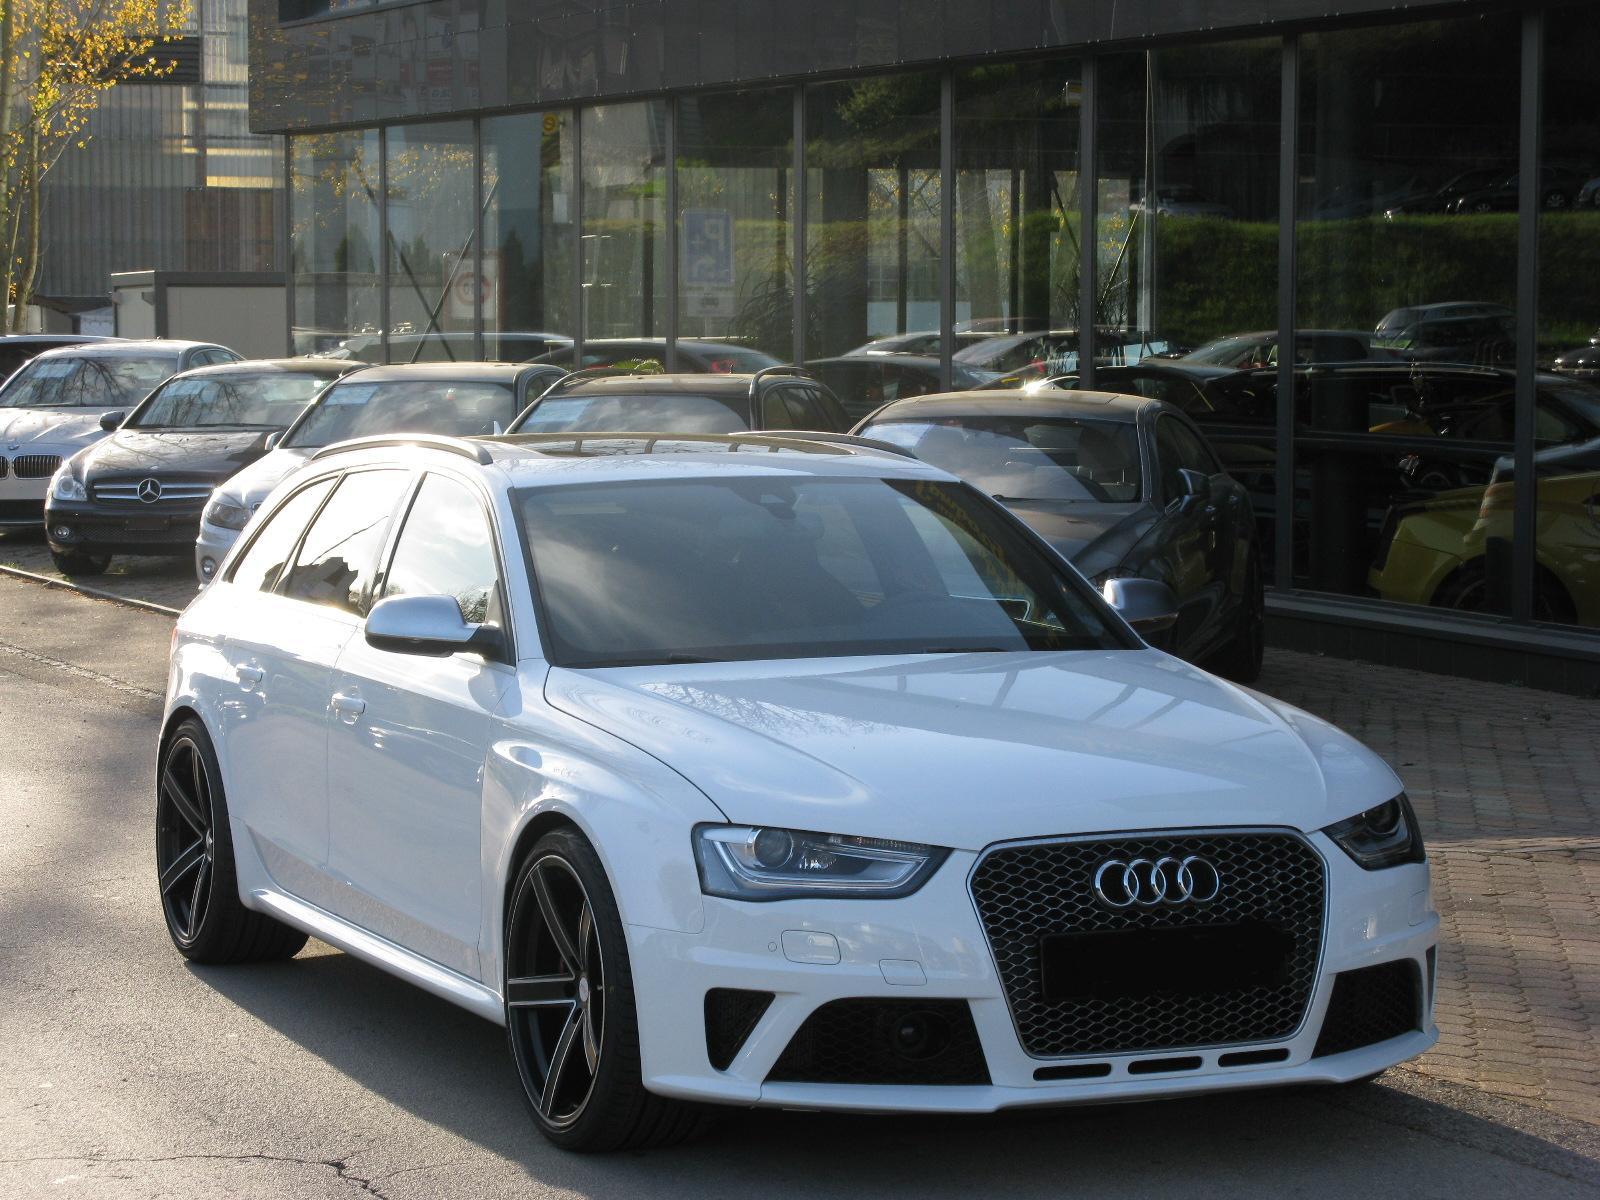 Audi Rs4 B8 Deluxe Wheels Deutschland Gmbh